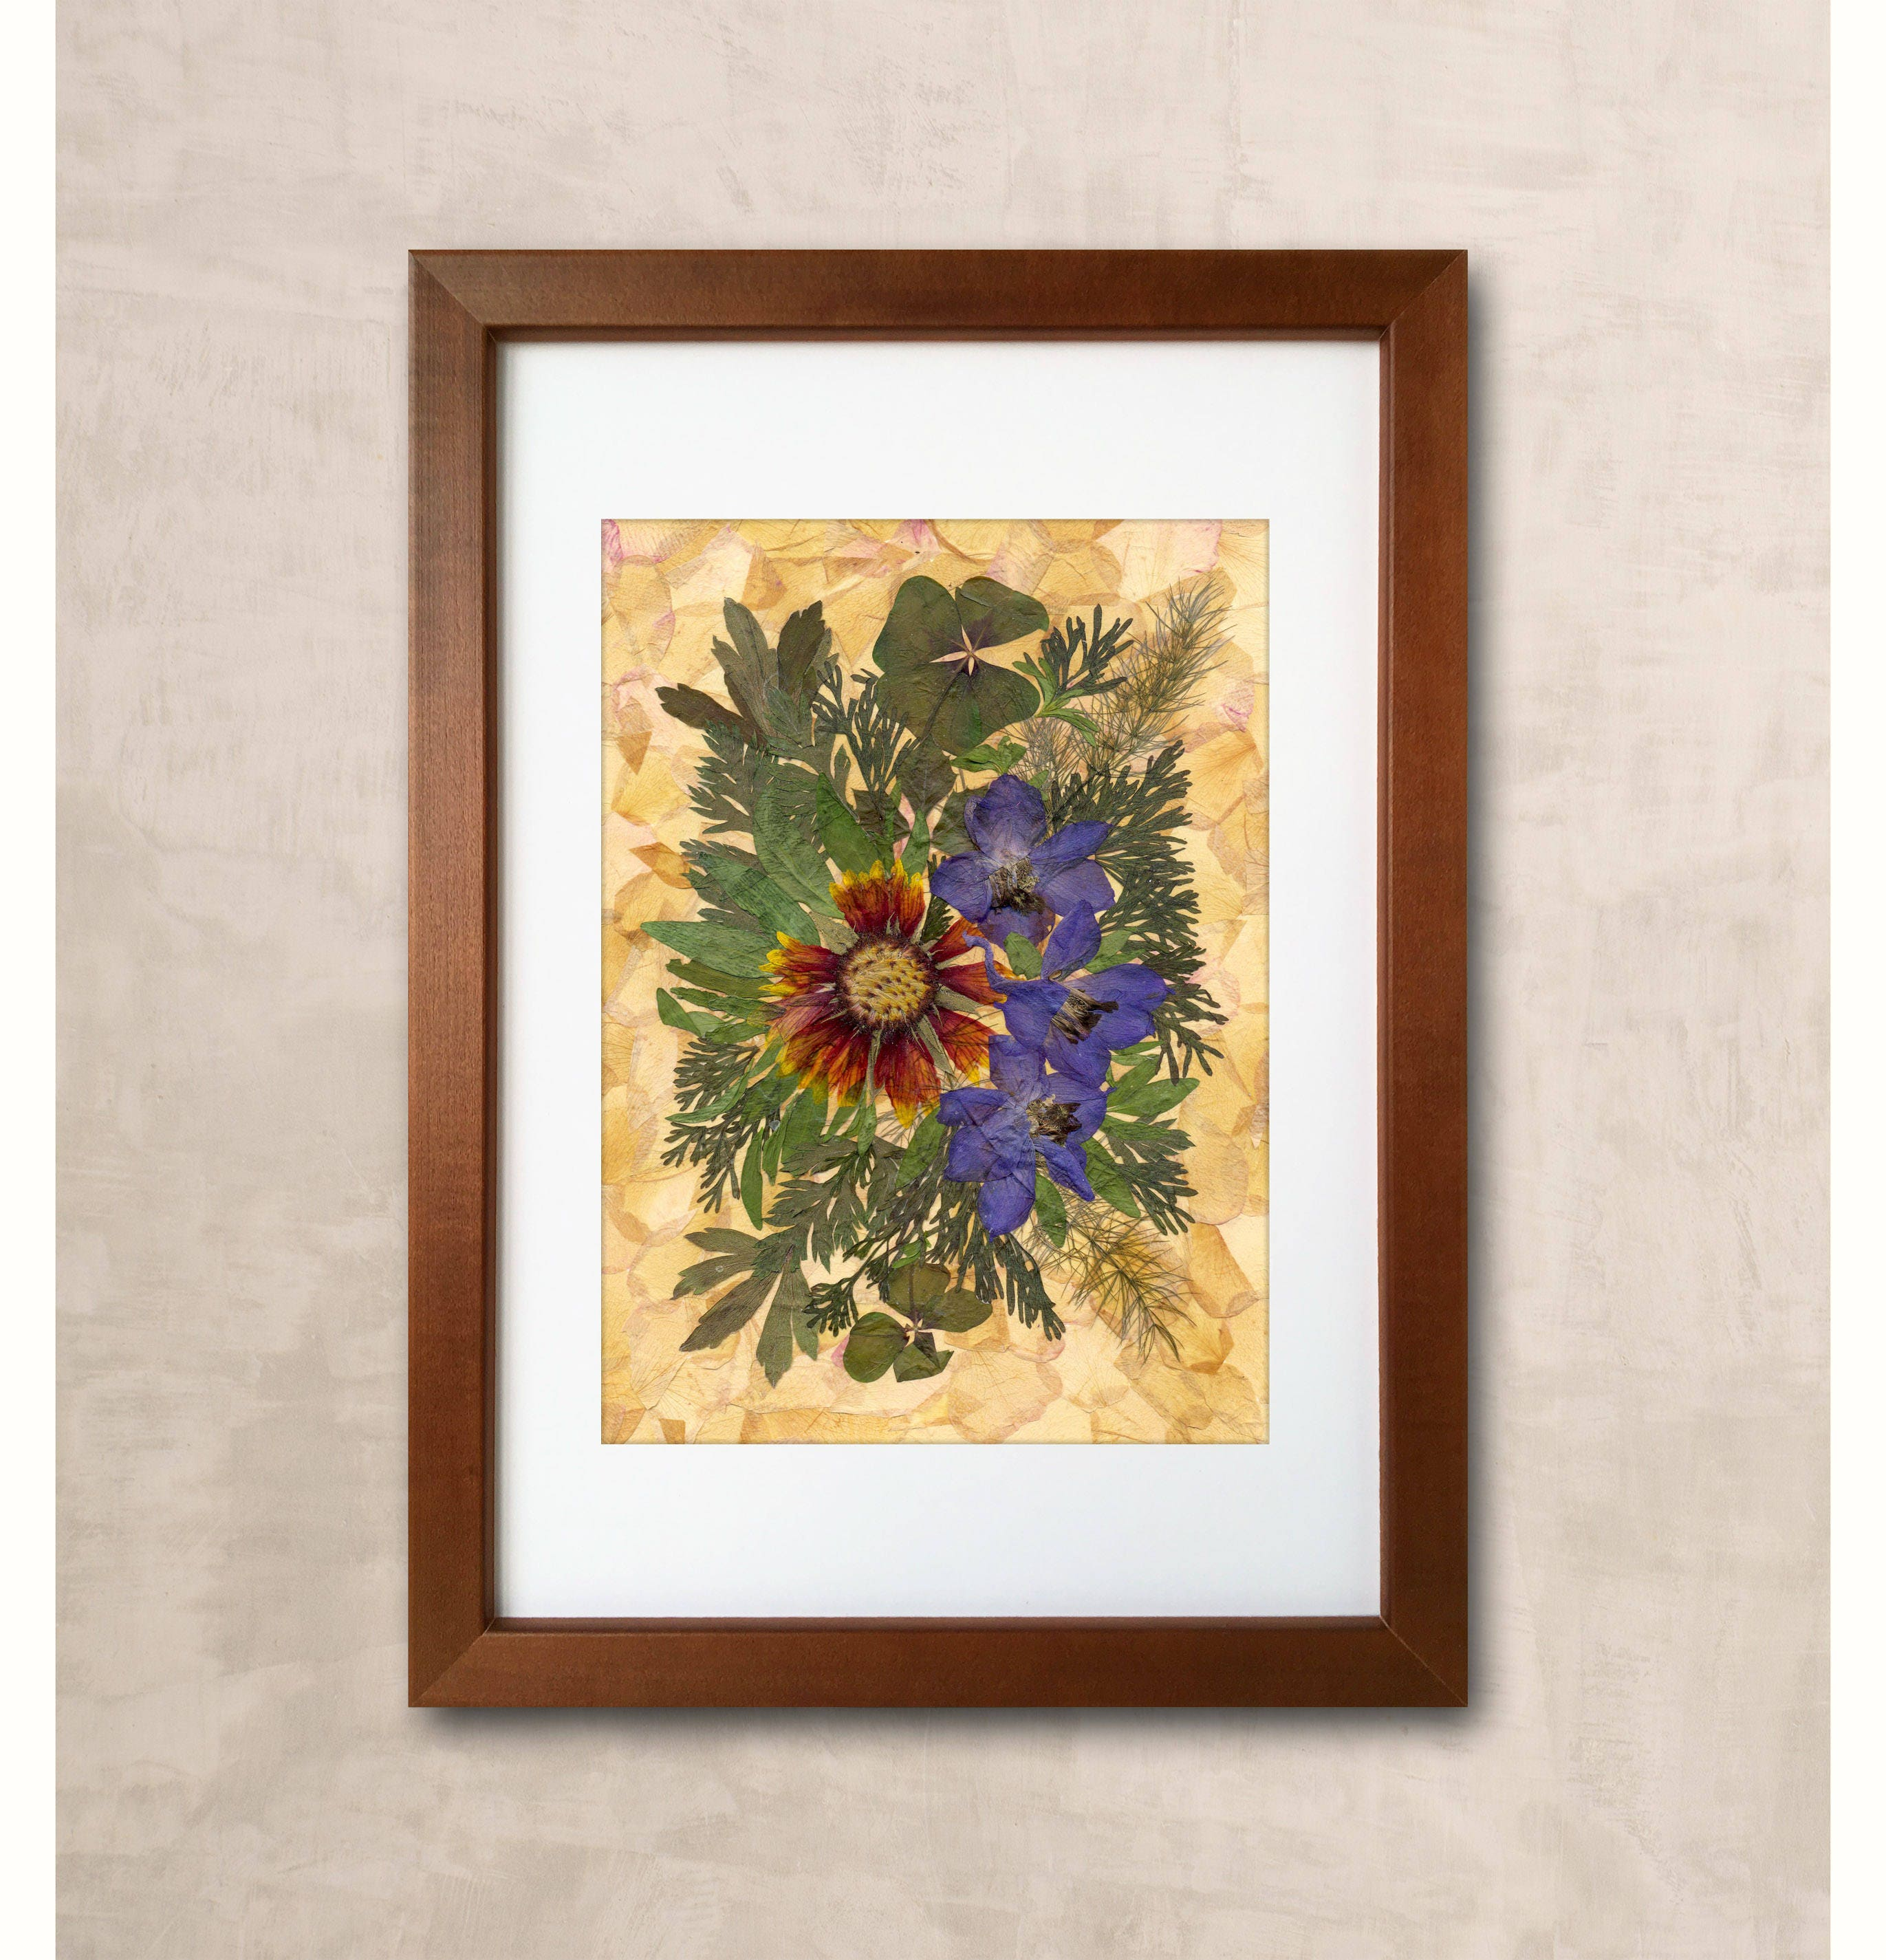 Gaillardia Pressed Flower Art Dried Flowers Pressed Flower